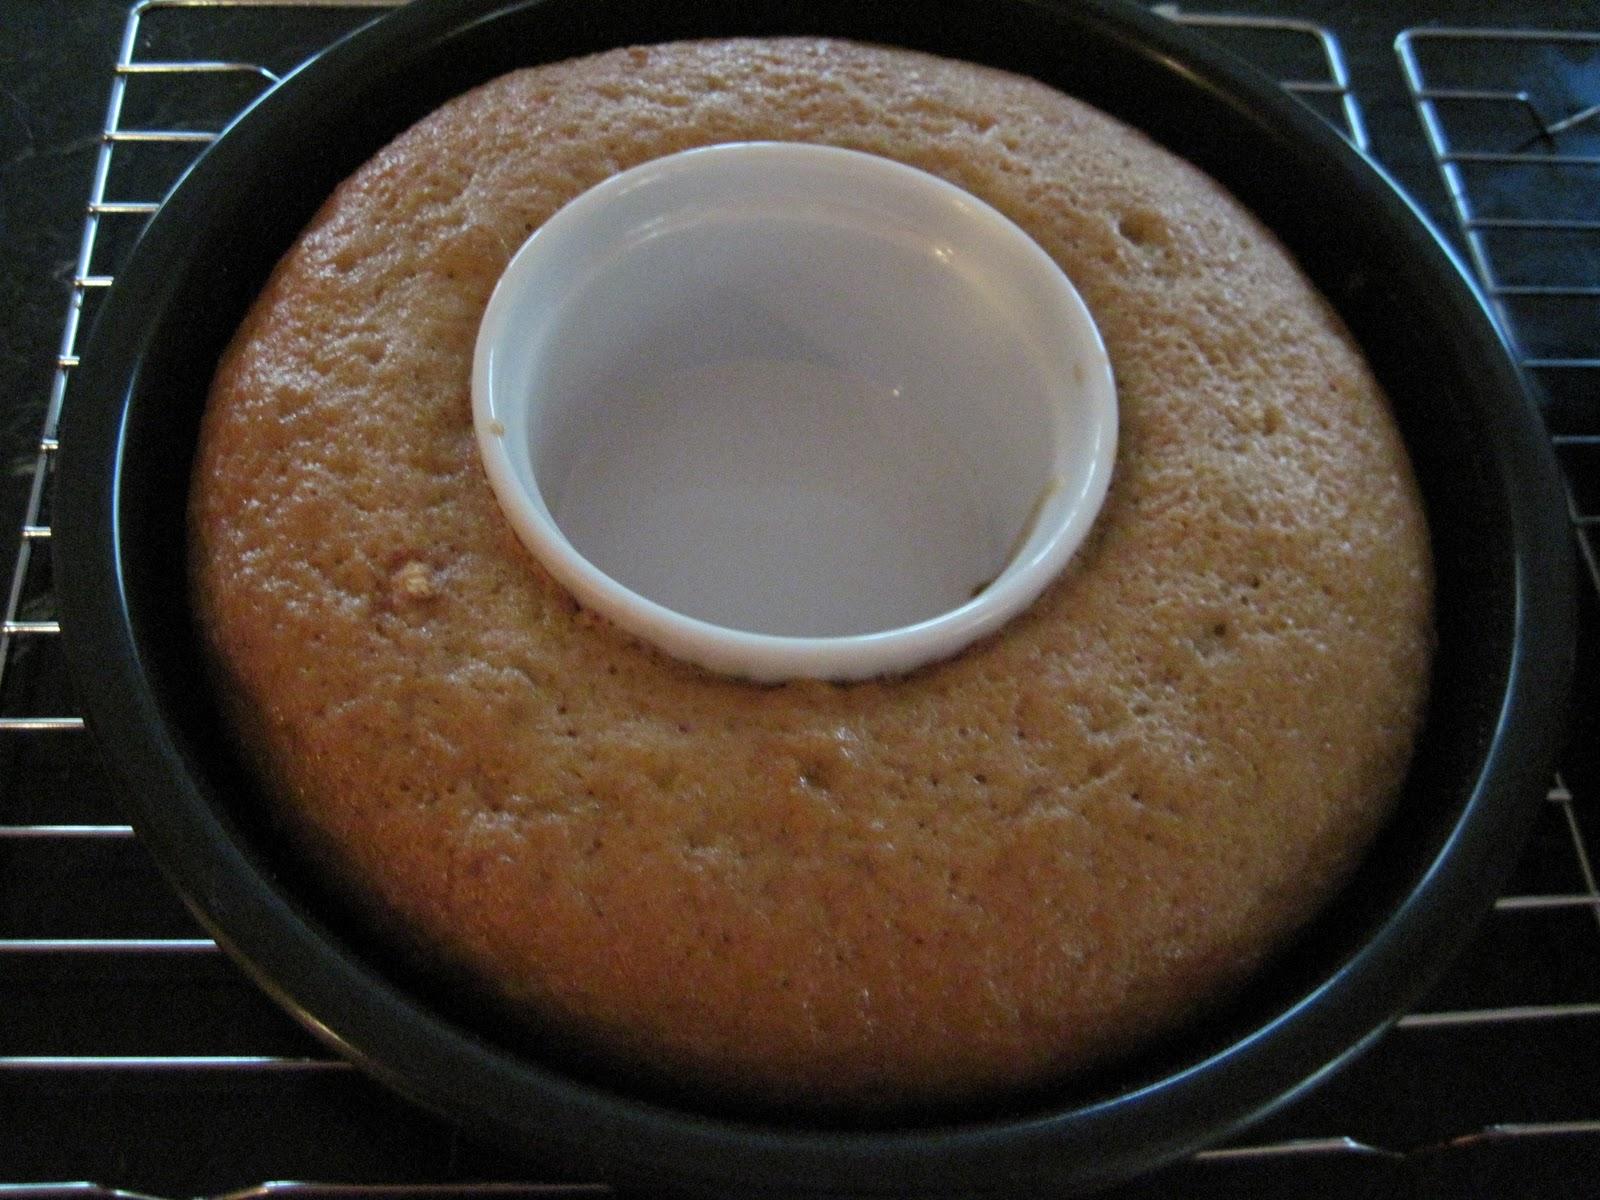 Diy Tube Pan A Baking Trick And A Cake Recipe Yankee